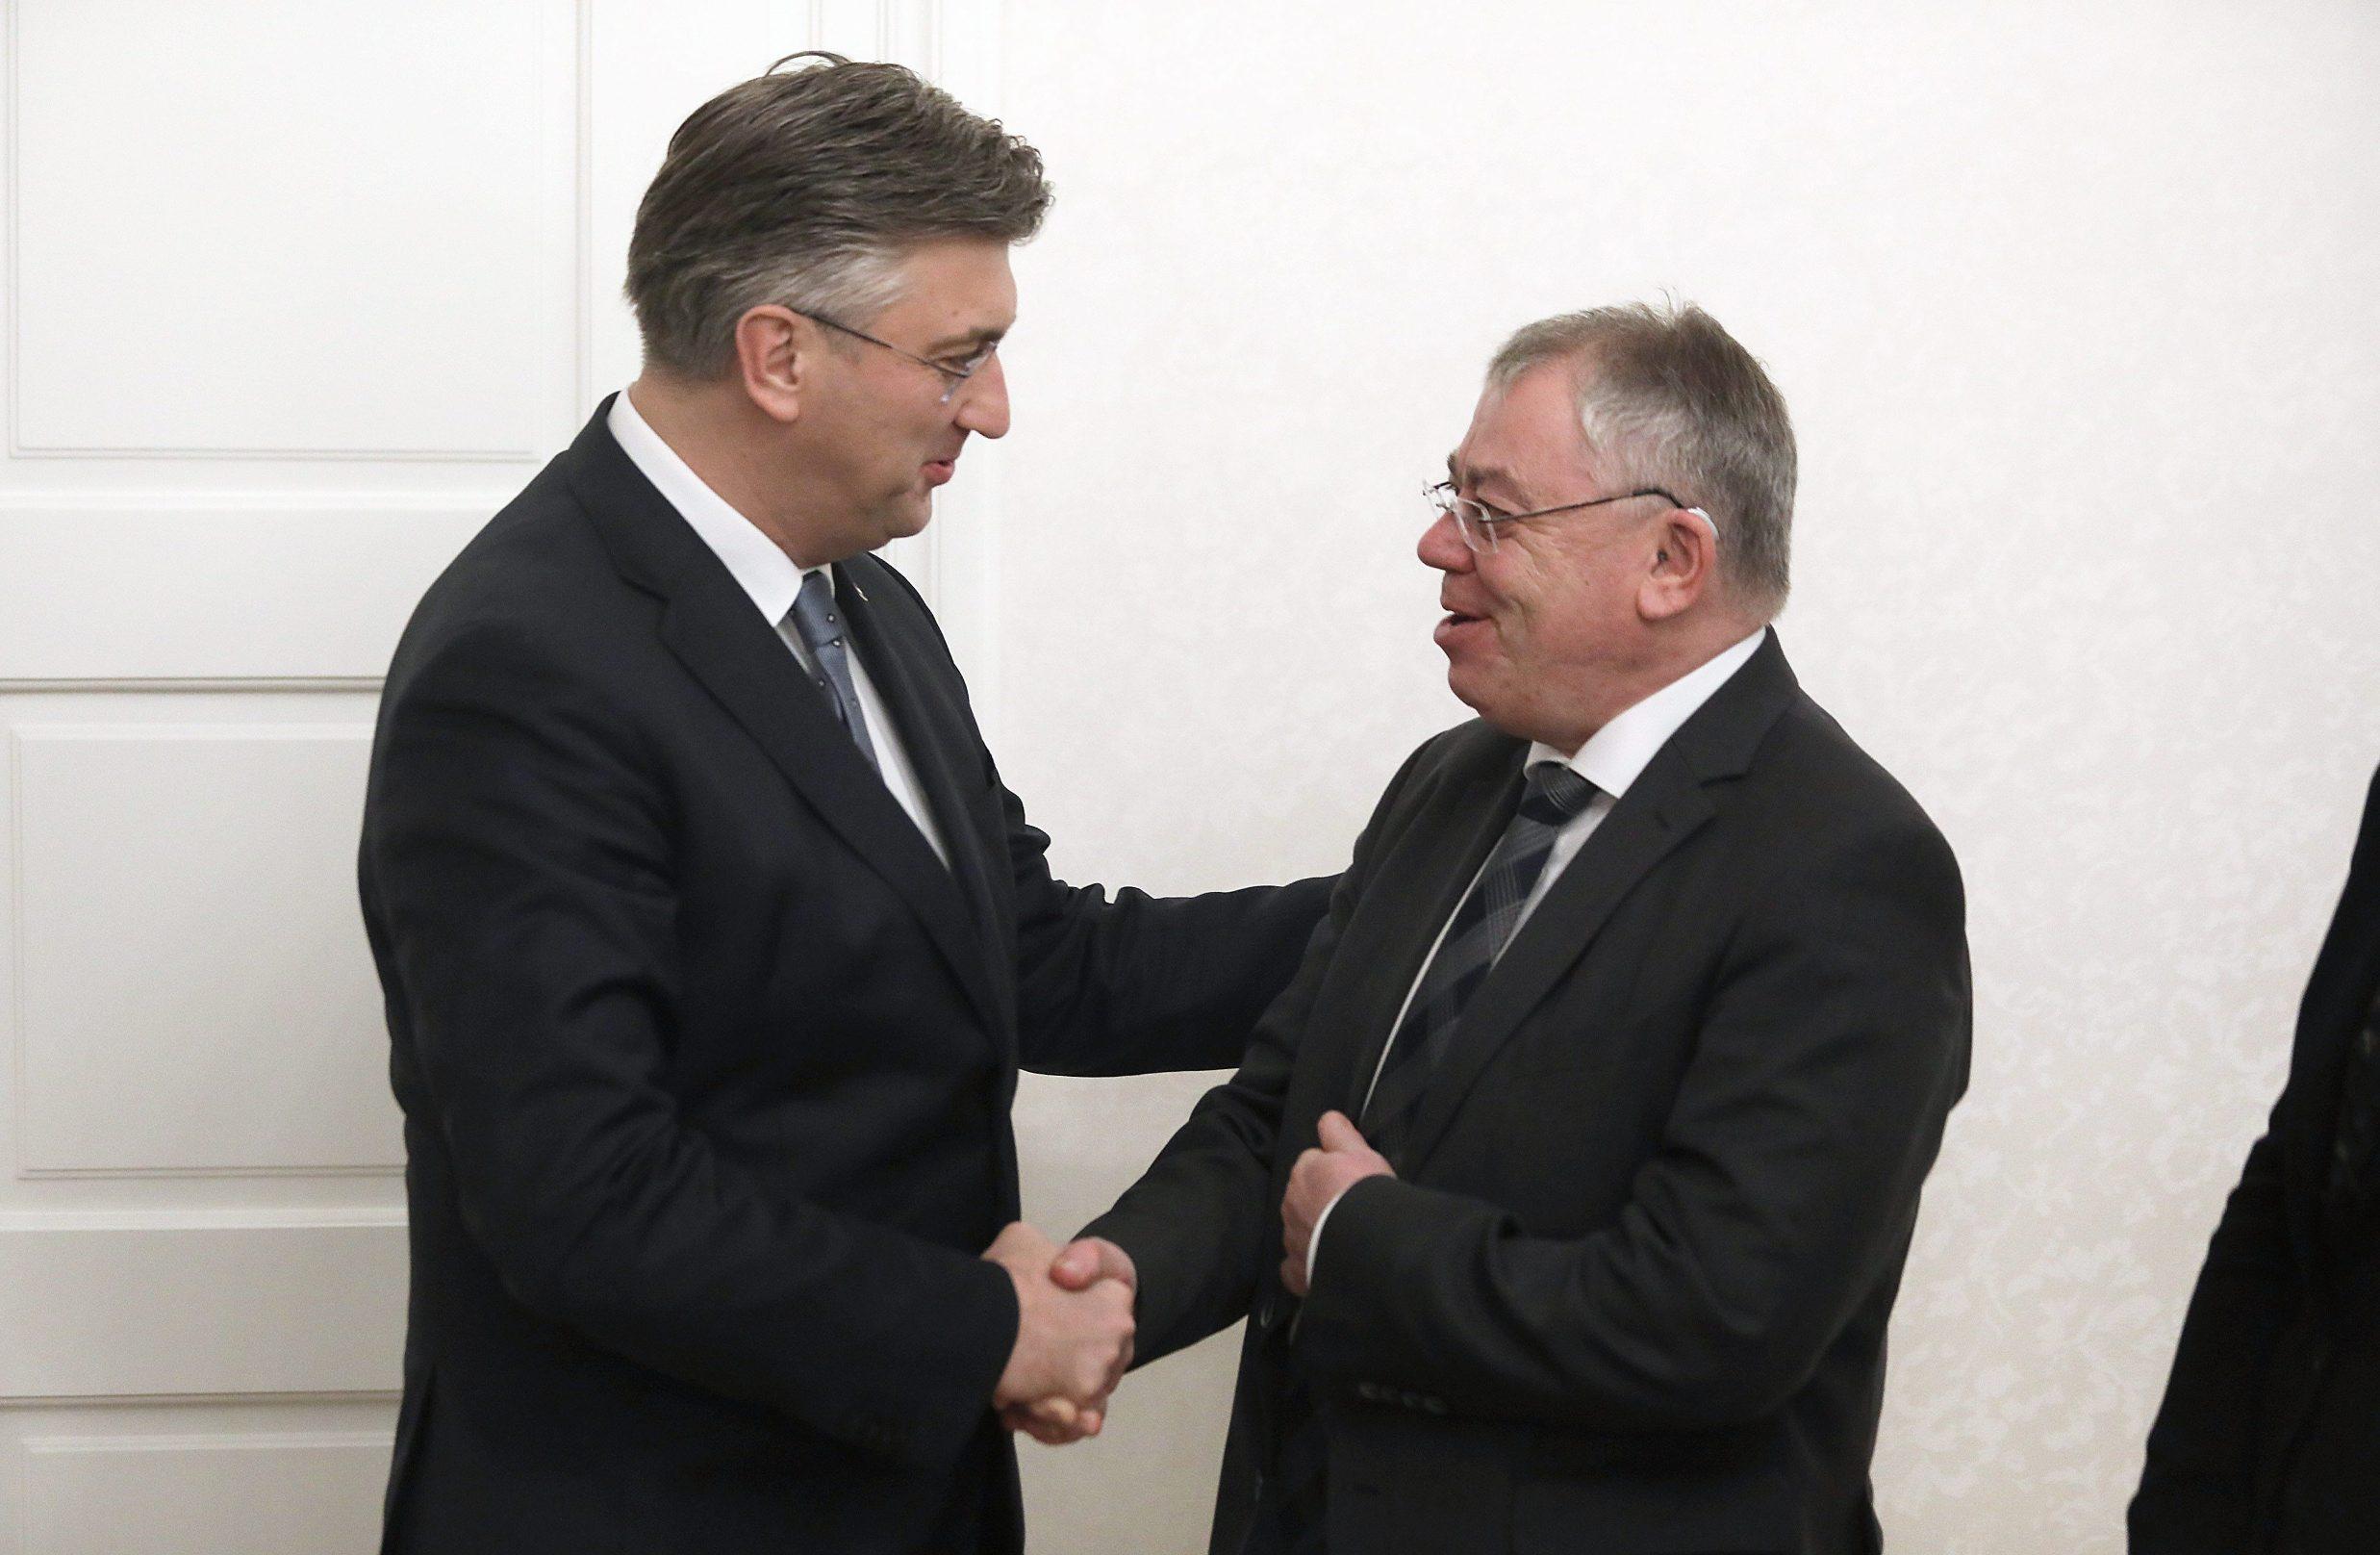 Predsjednik Vlade Andrej Plenković primio je predsjednika Europskog revizorskog suda Klausa Heinera Lehnea (desno)